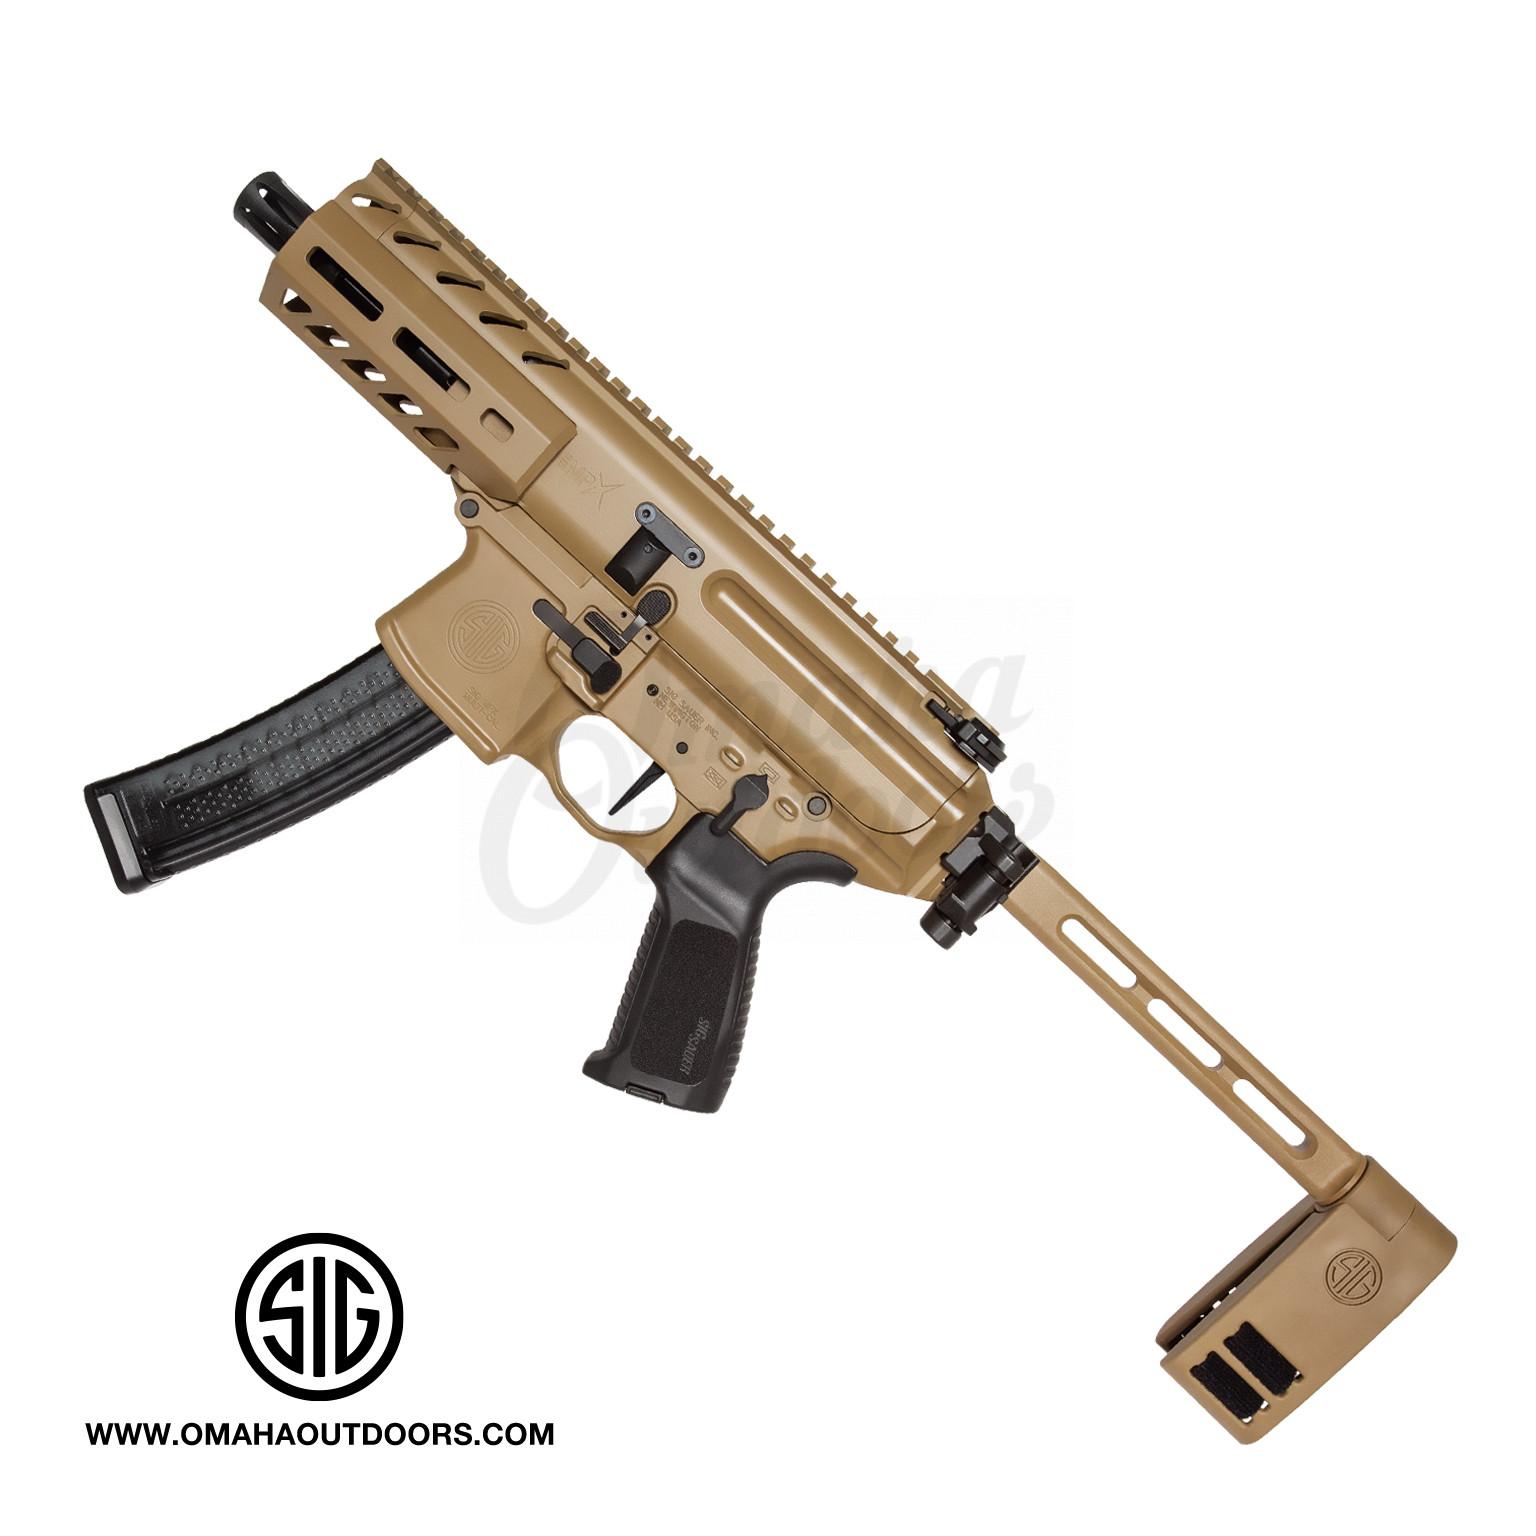 Sig Sauer MPX K Coyote Rifle Style Pistol 4 5″ 9mm 30 RD M-LOK PCB Brace  PMPX-4B-9-COY